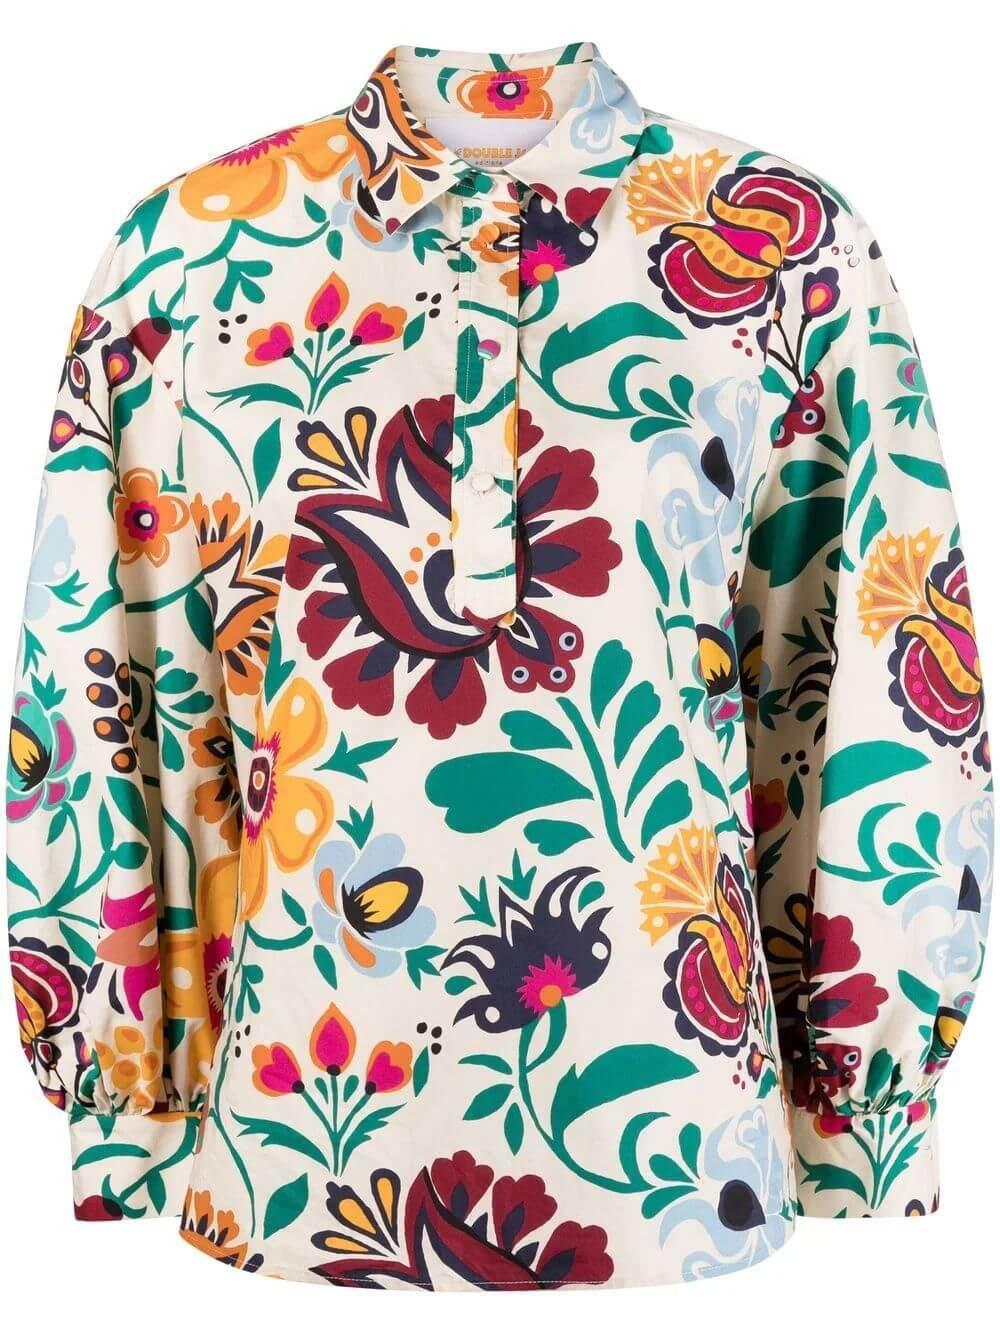 Floral Poet Shirt Item # SHI0055-COT001